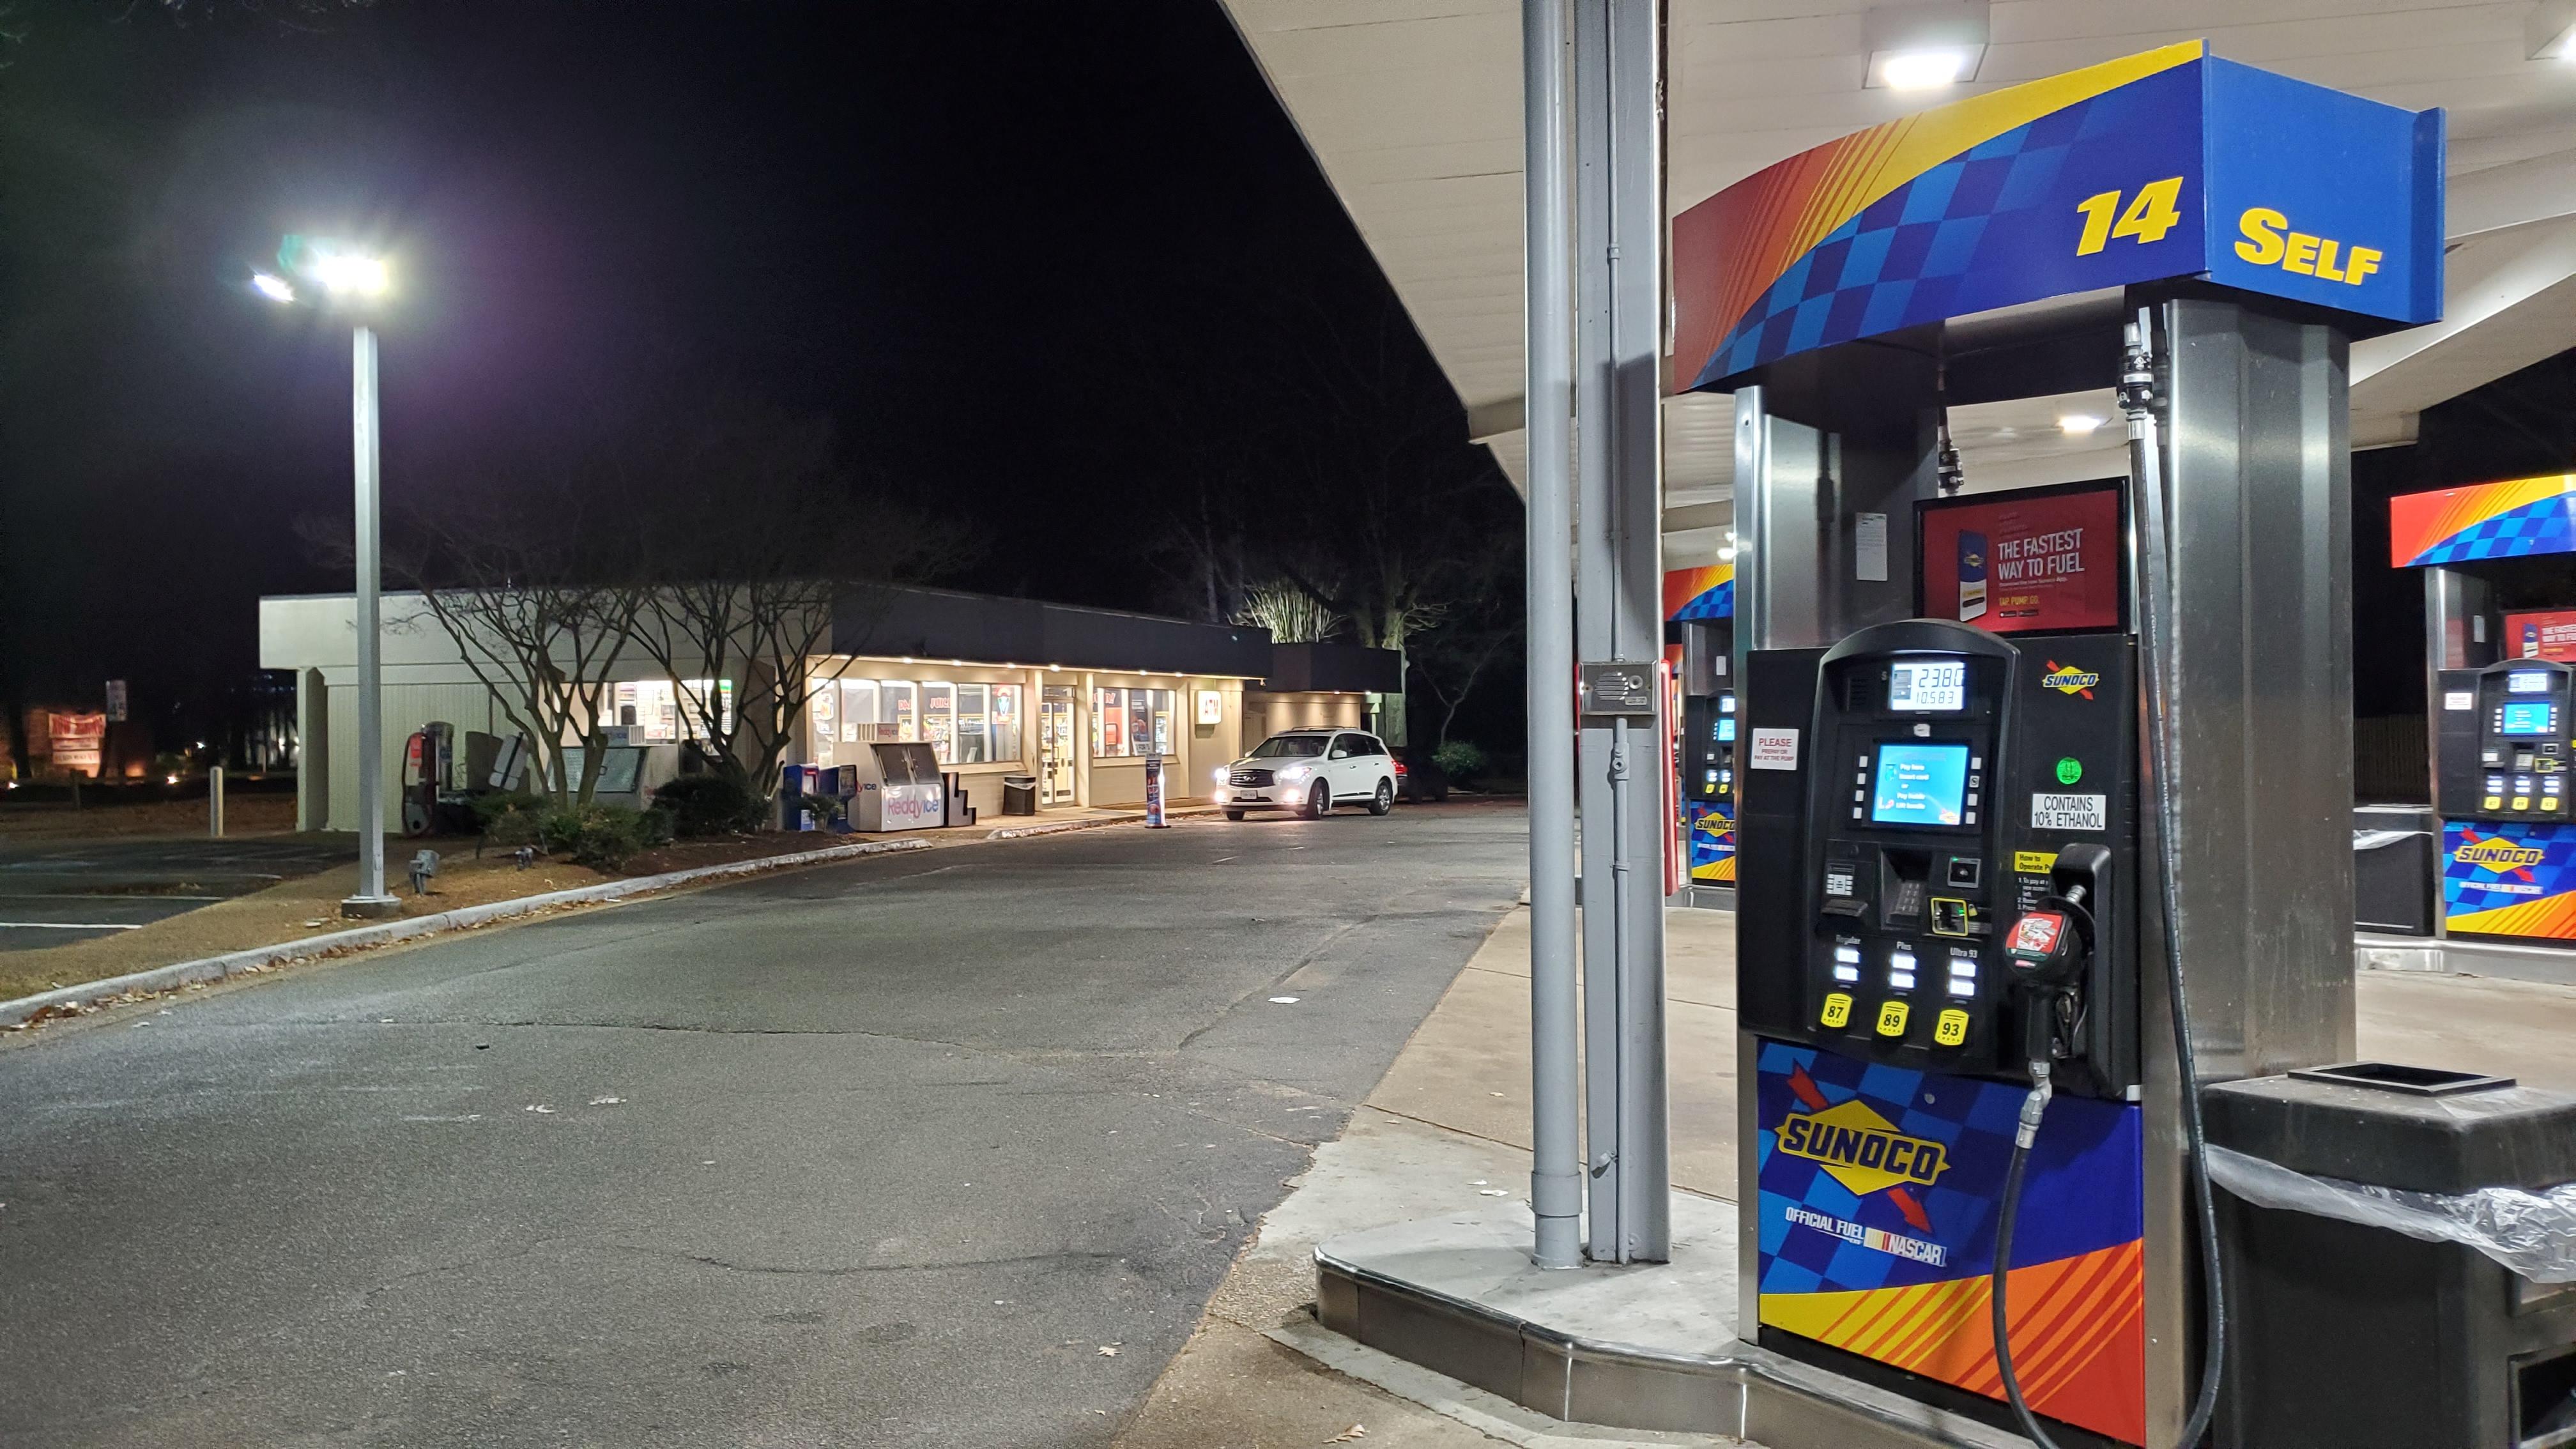 Bitcoin ATM inside Sunoco